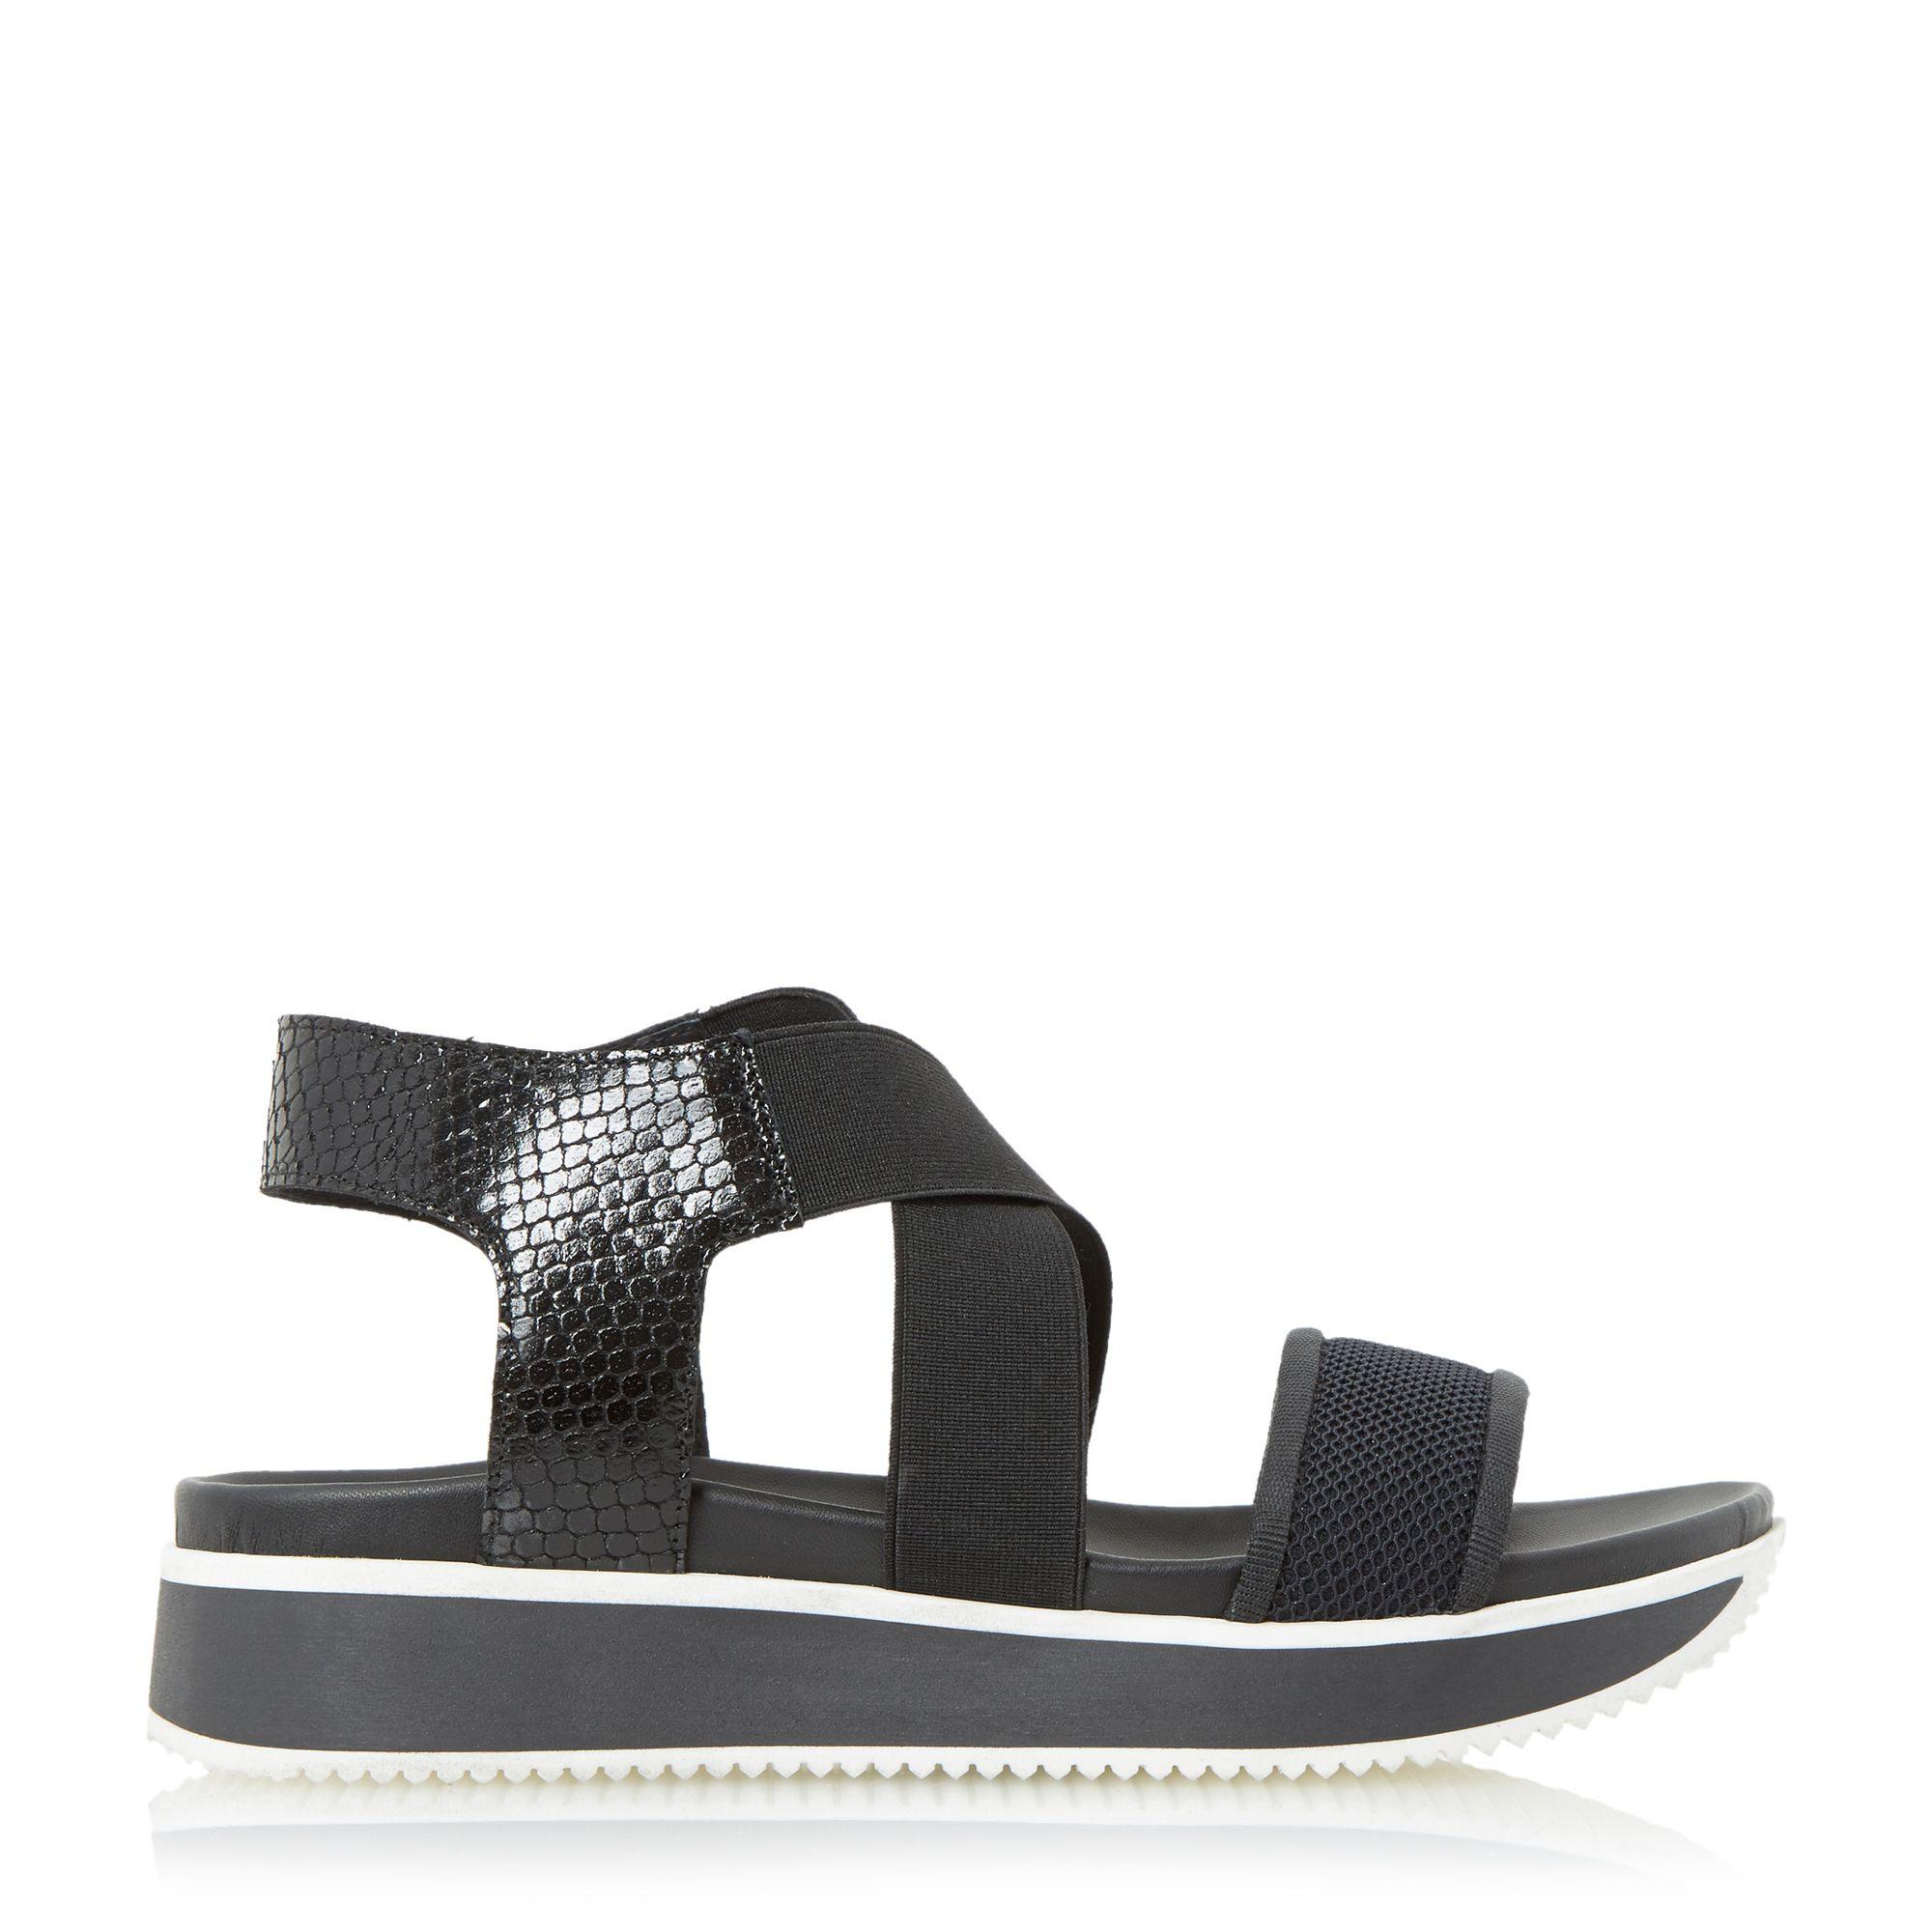 ladies's get dressed shoes no heel